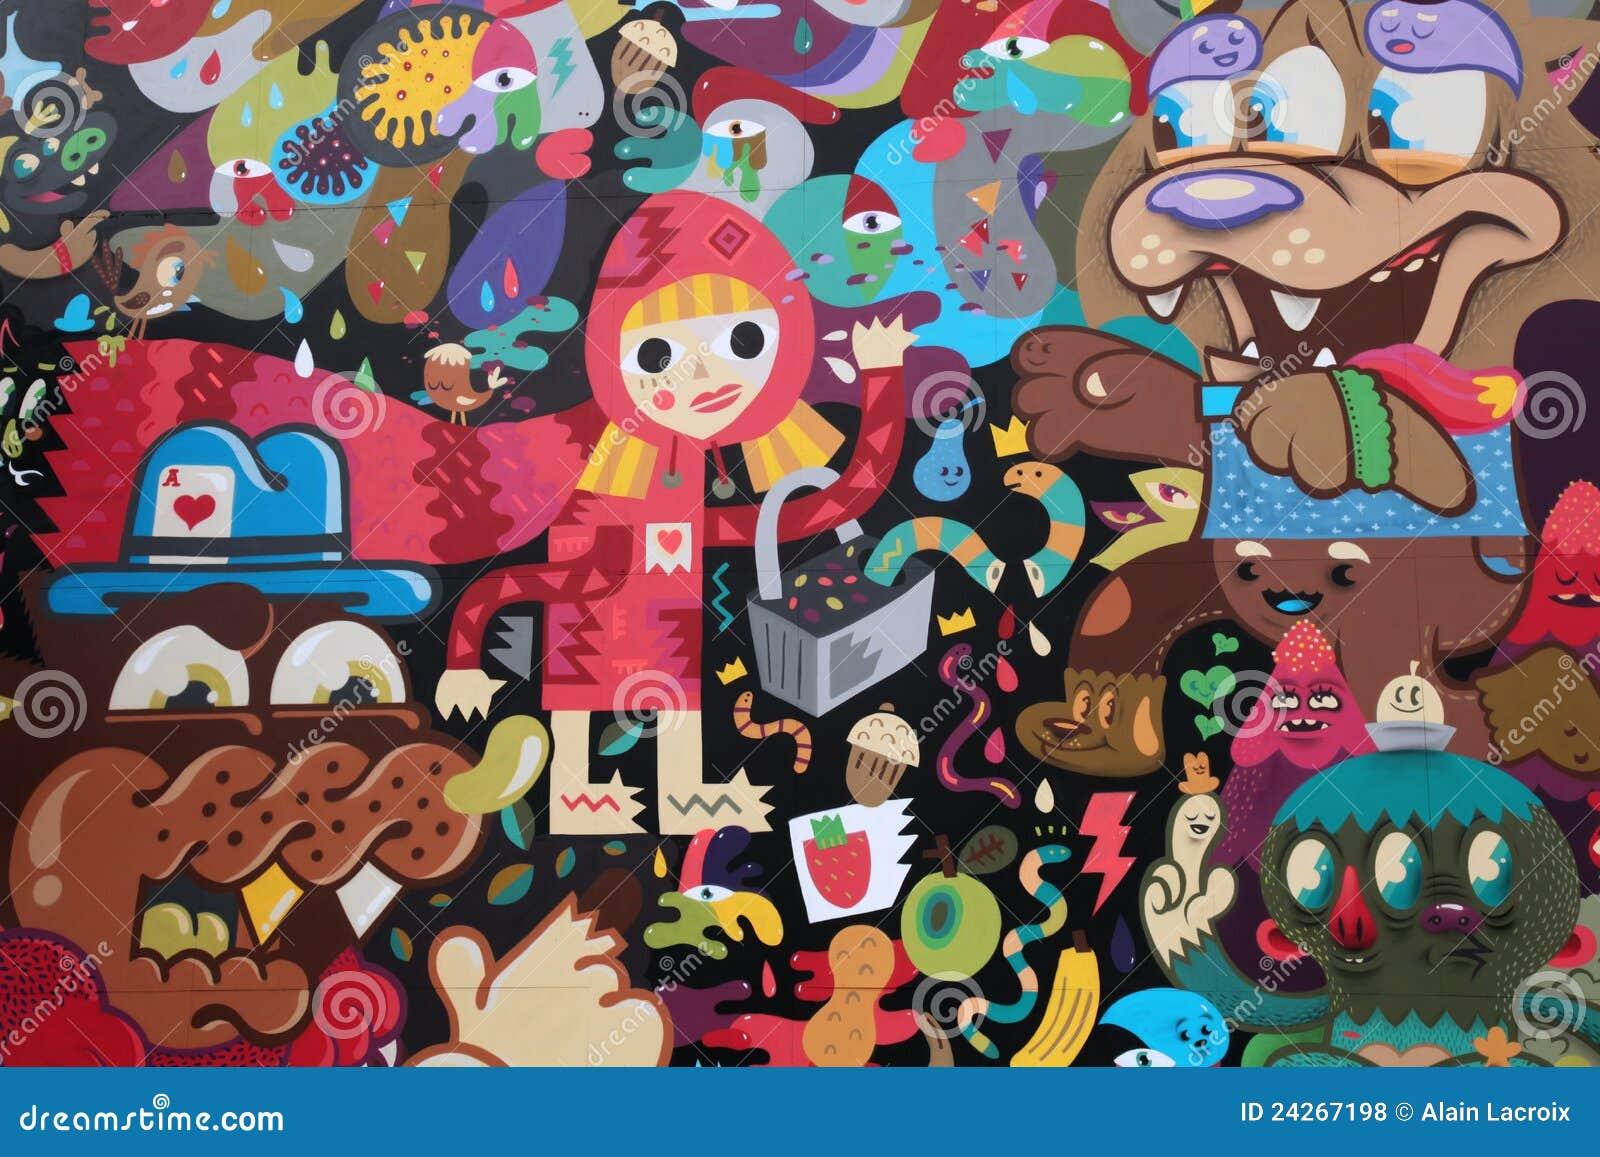 Fairytale street art